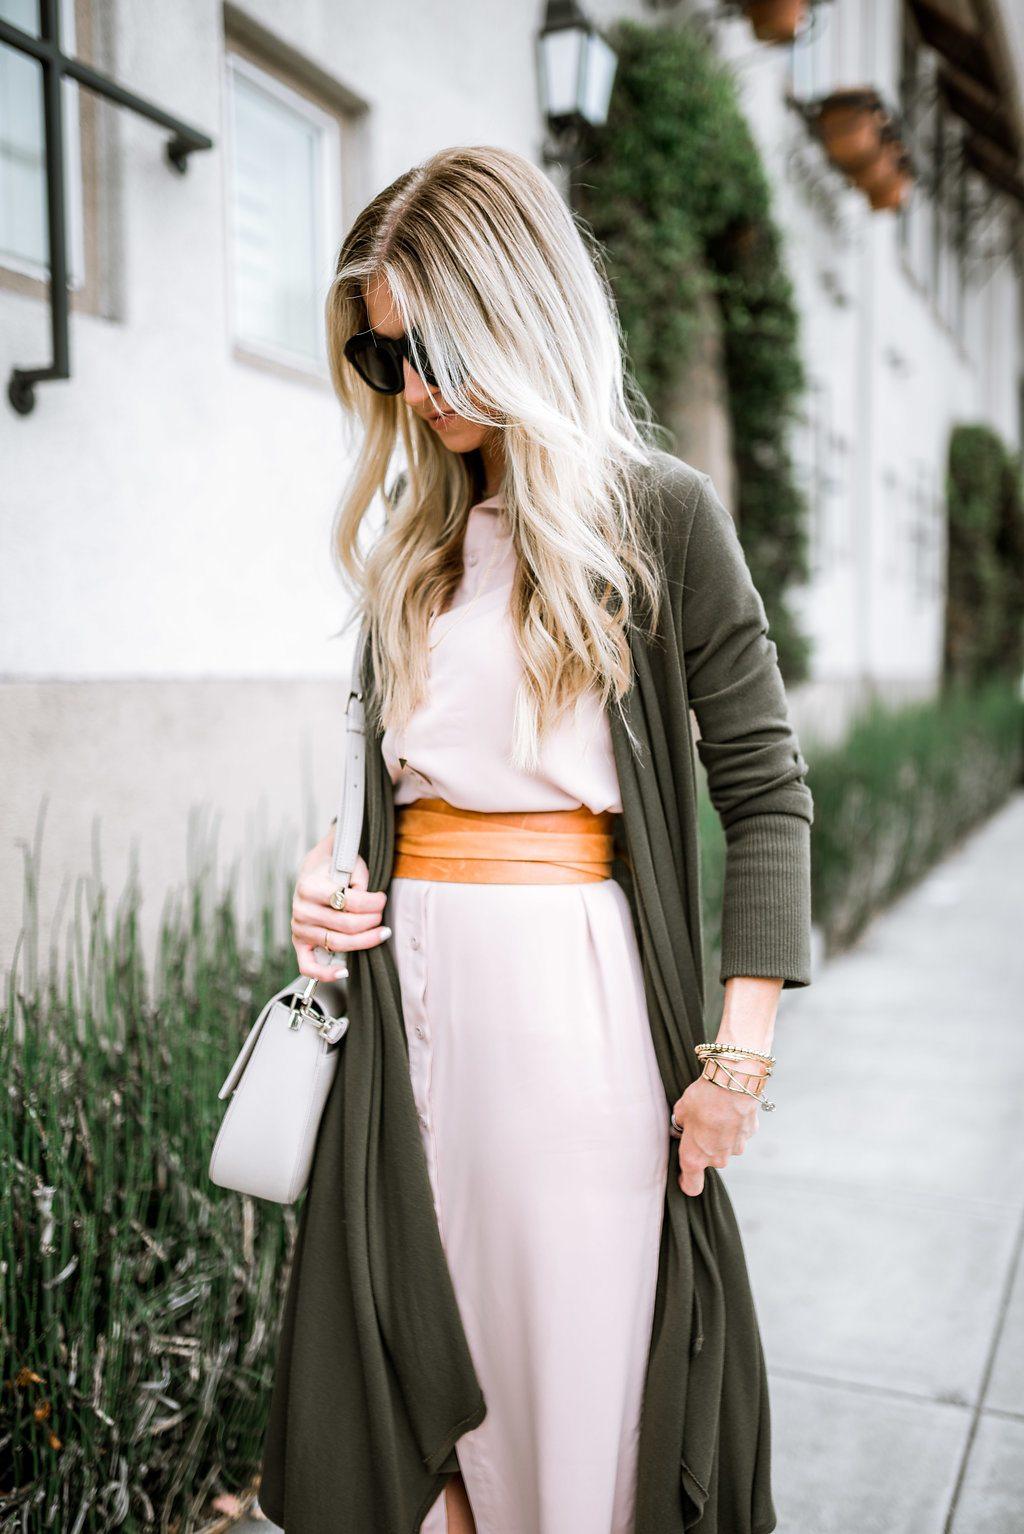 Blush dress + olive cardigan